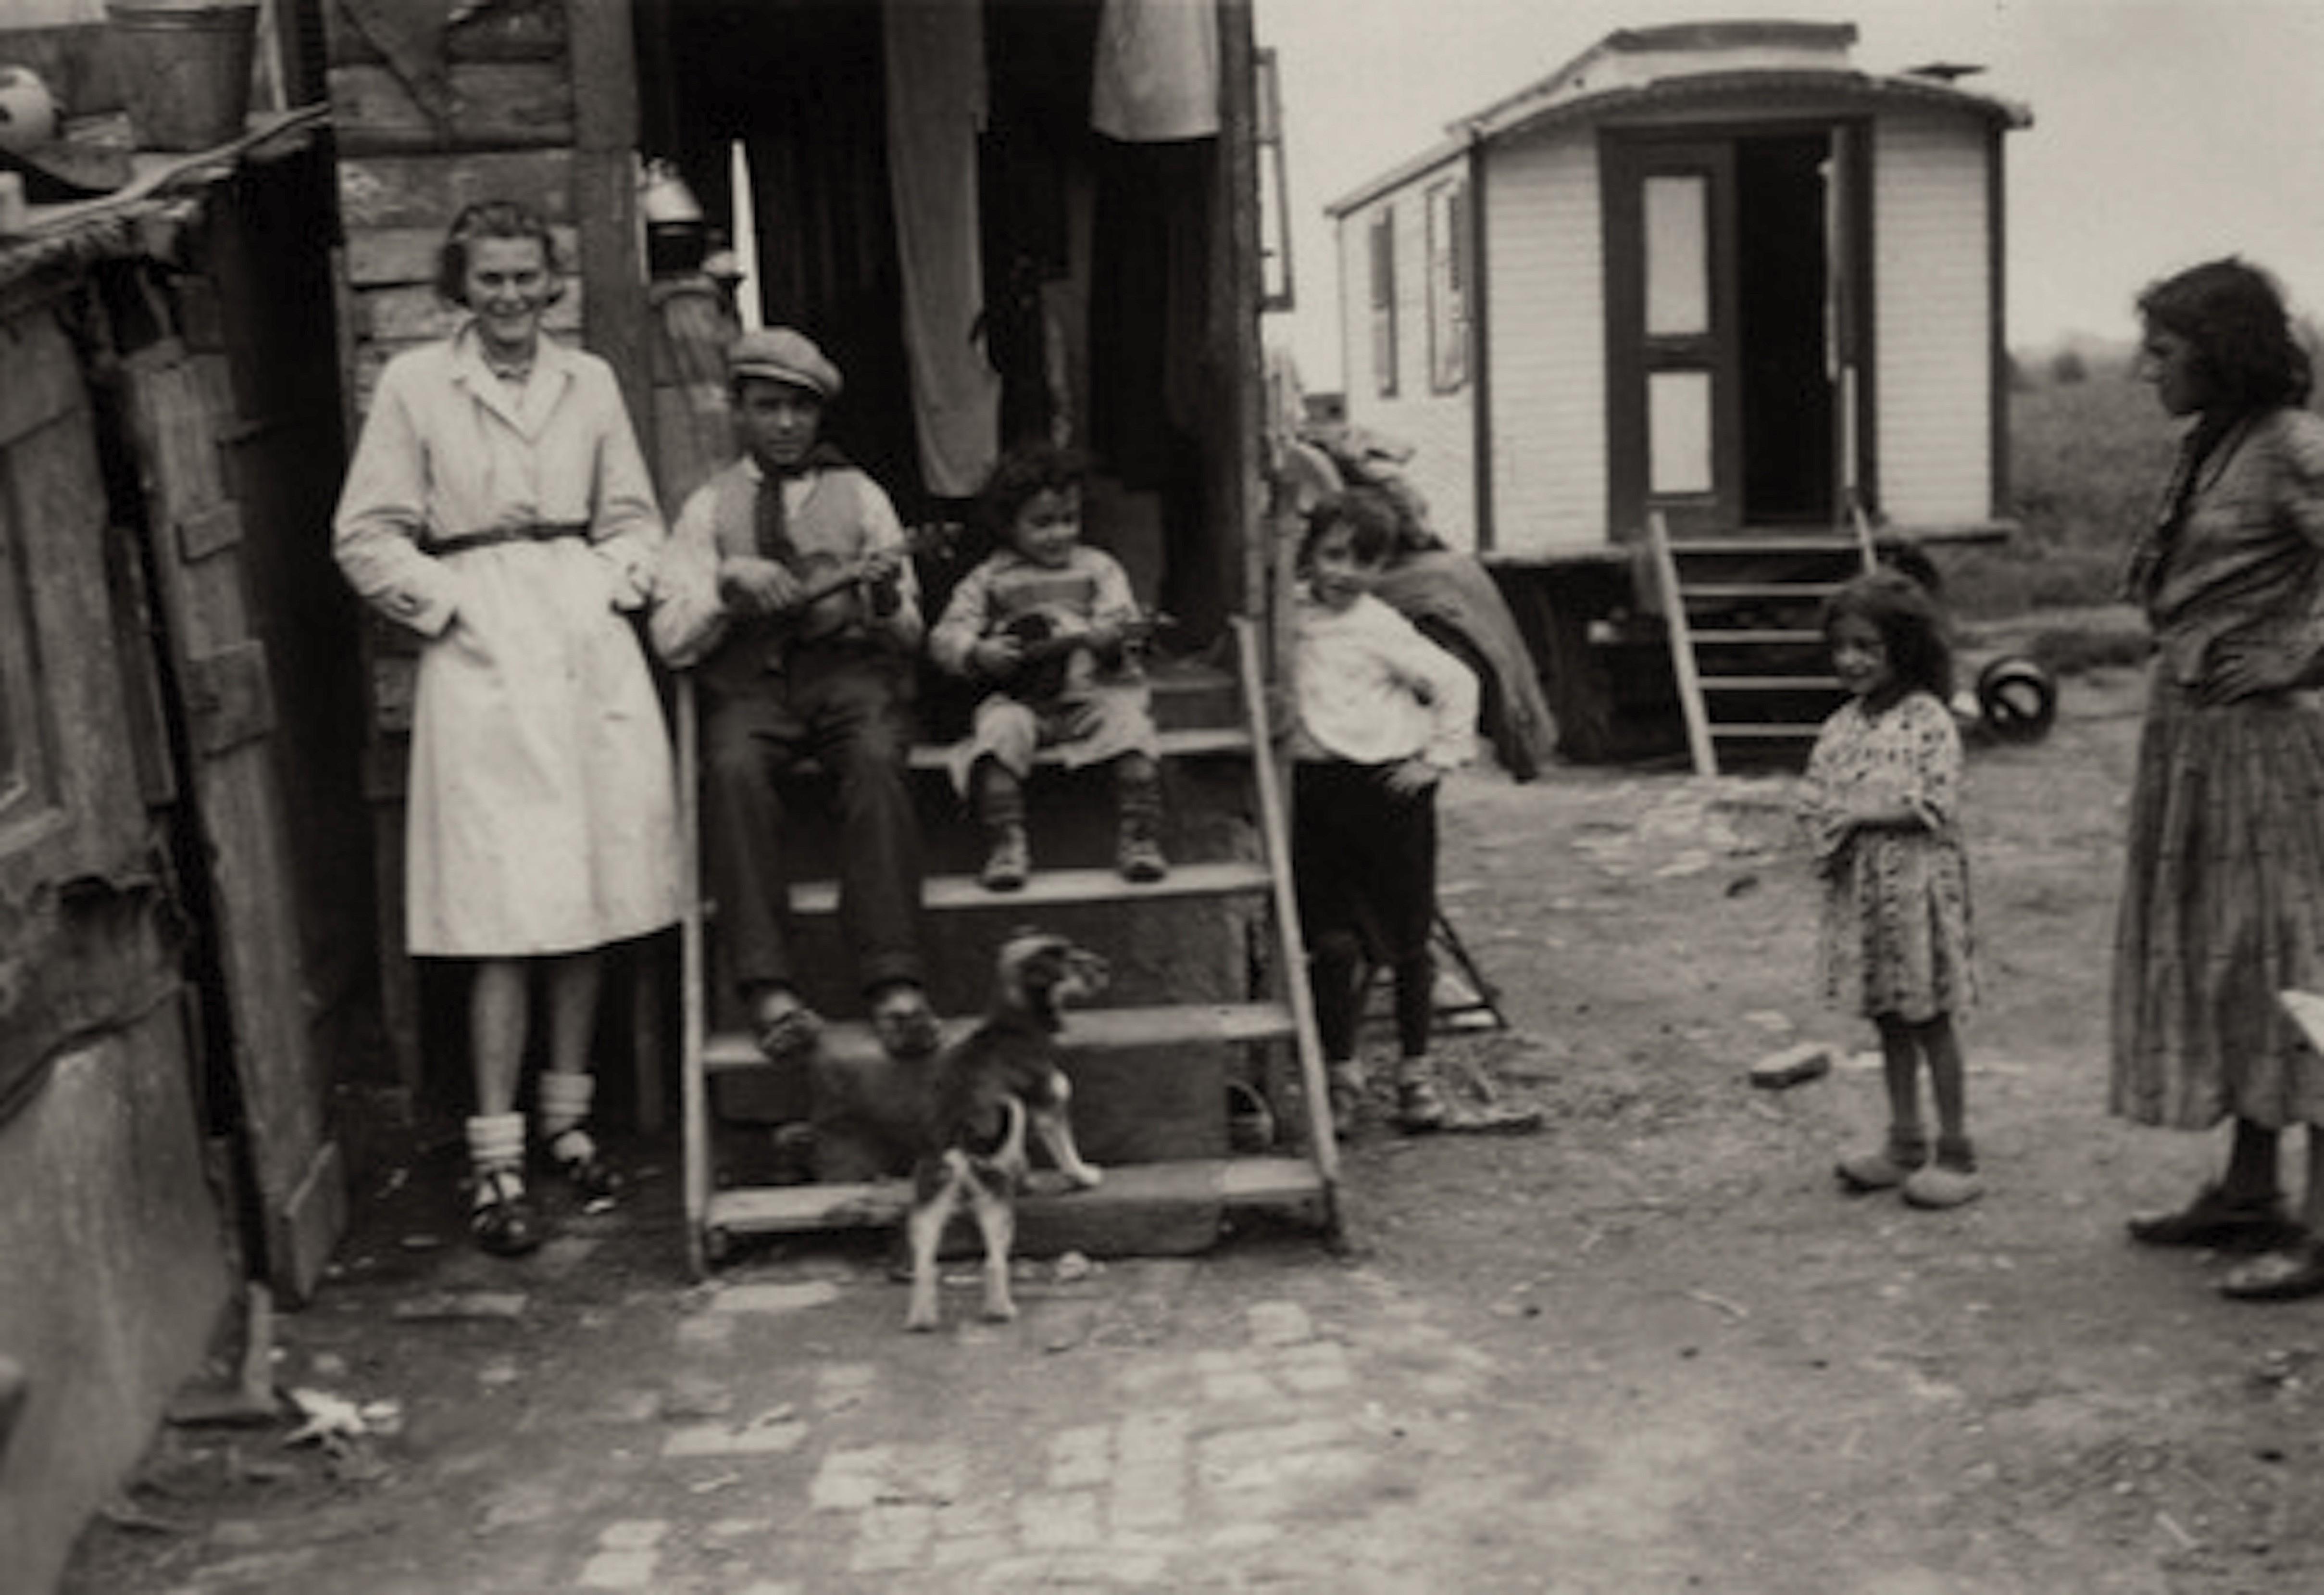 Jan Wies – Zigeuner woonwagens in Haarlemmermeer